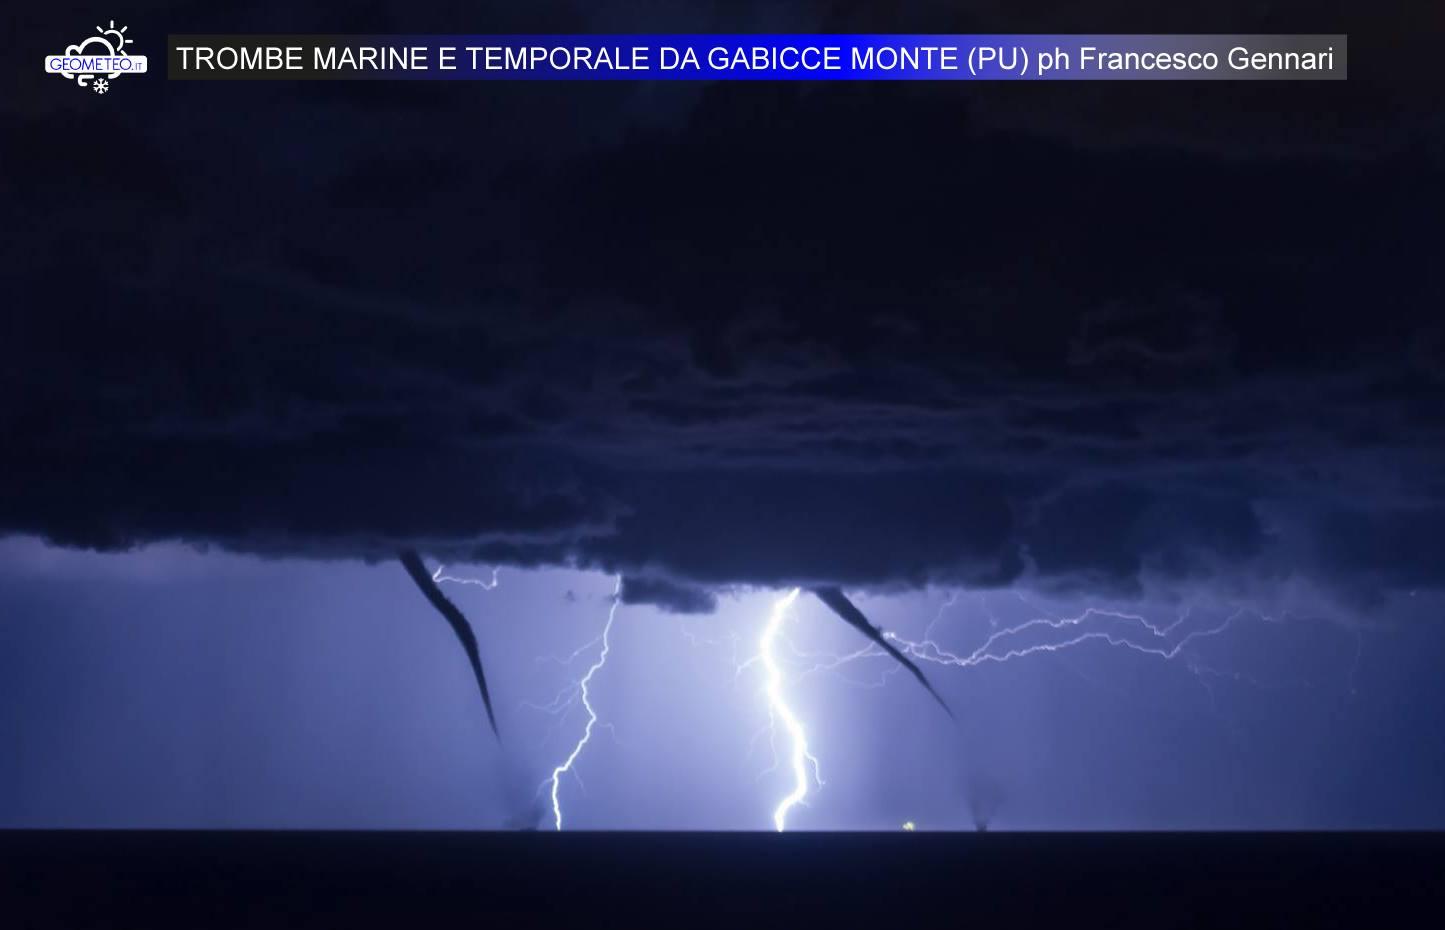 trombe marine e temporale a gabicce (PU)-13730844_1008709955892360_8226892059519585472_o.jpg